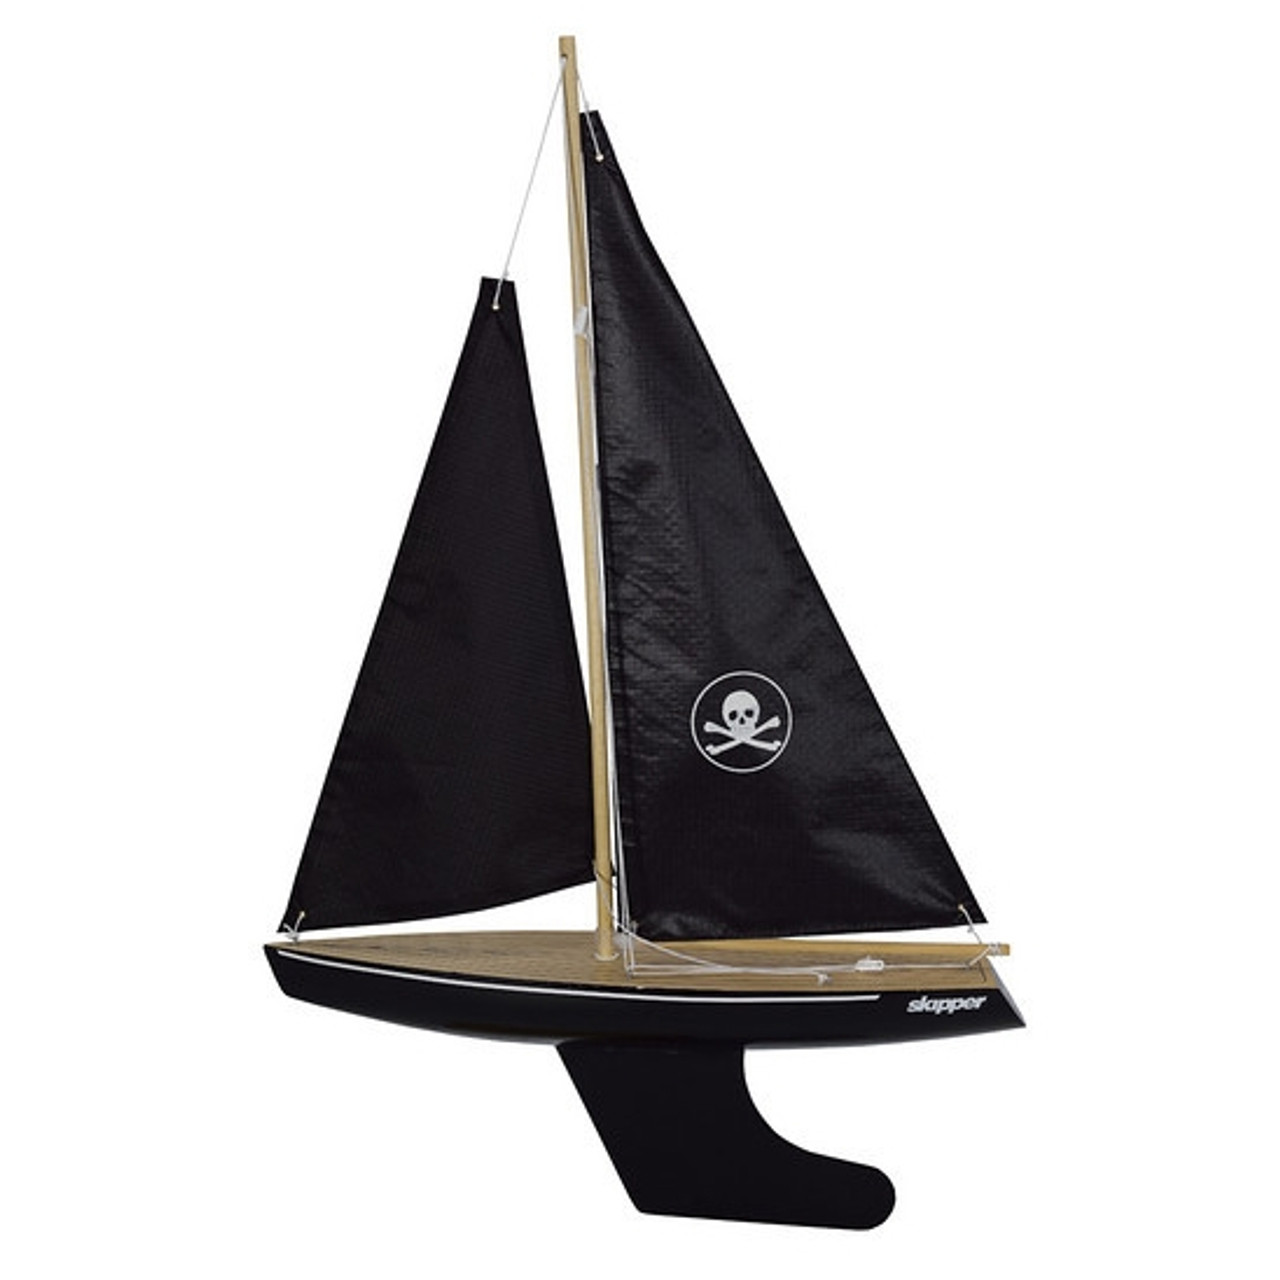 Skipper Pond Yacht - Pirate - 12 Inch